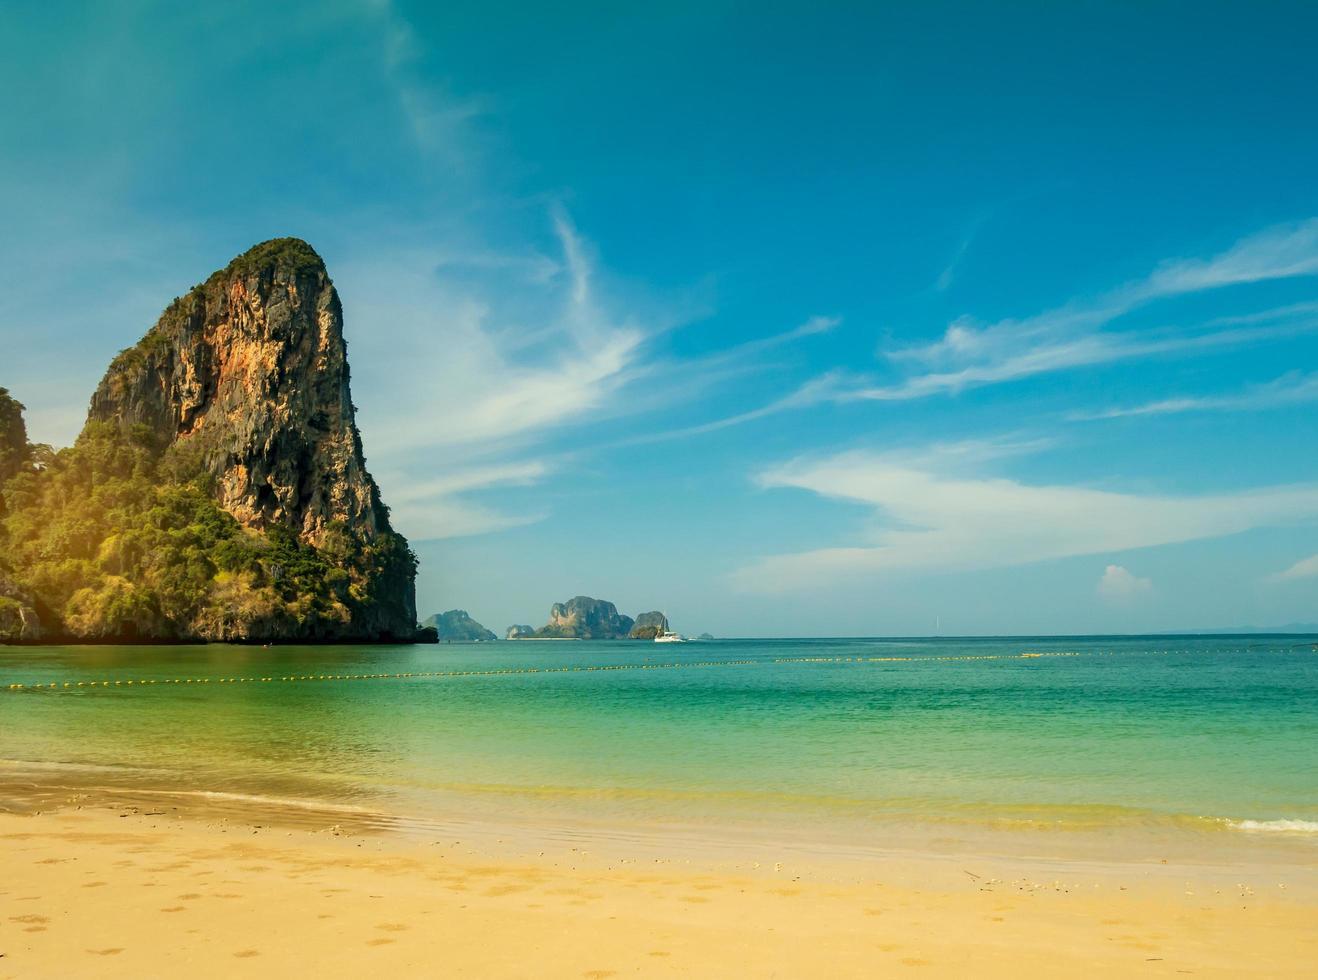 tropisch strand en kalksteenbergen foto